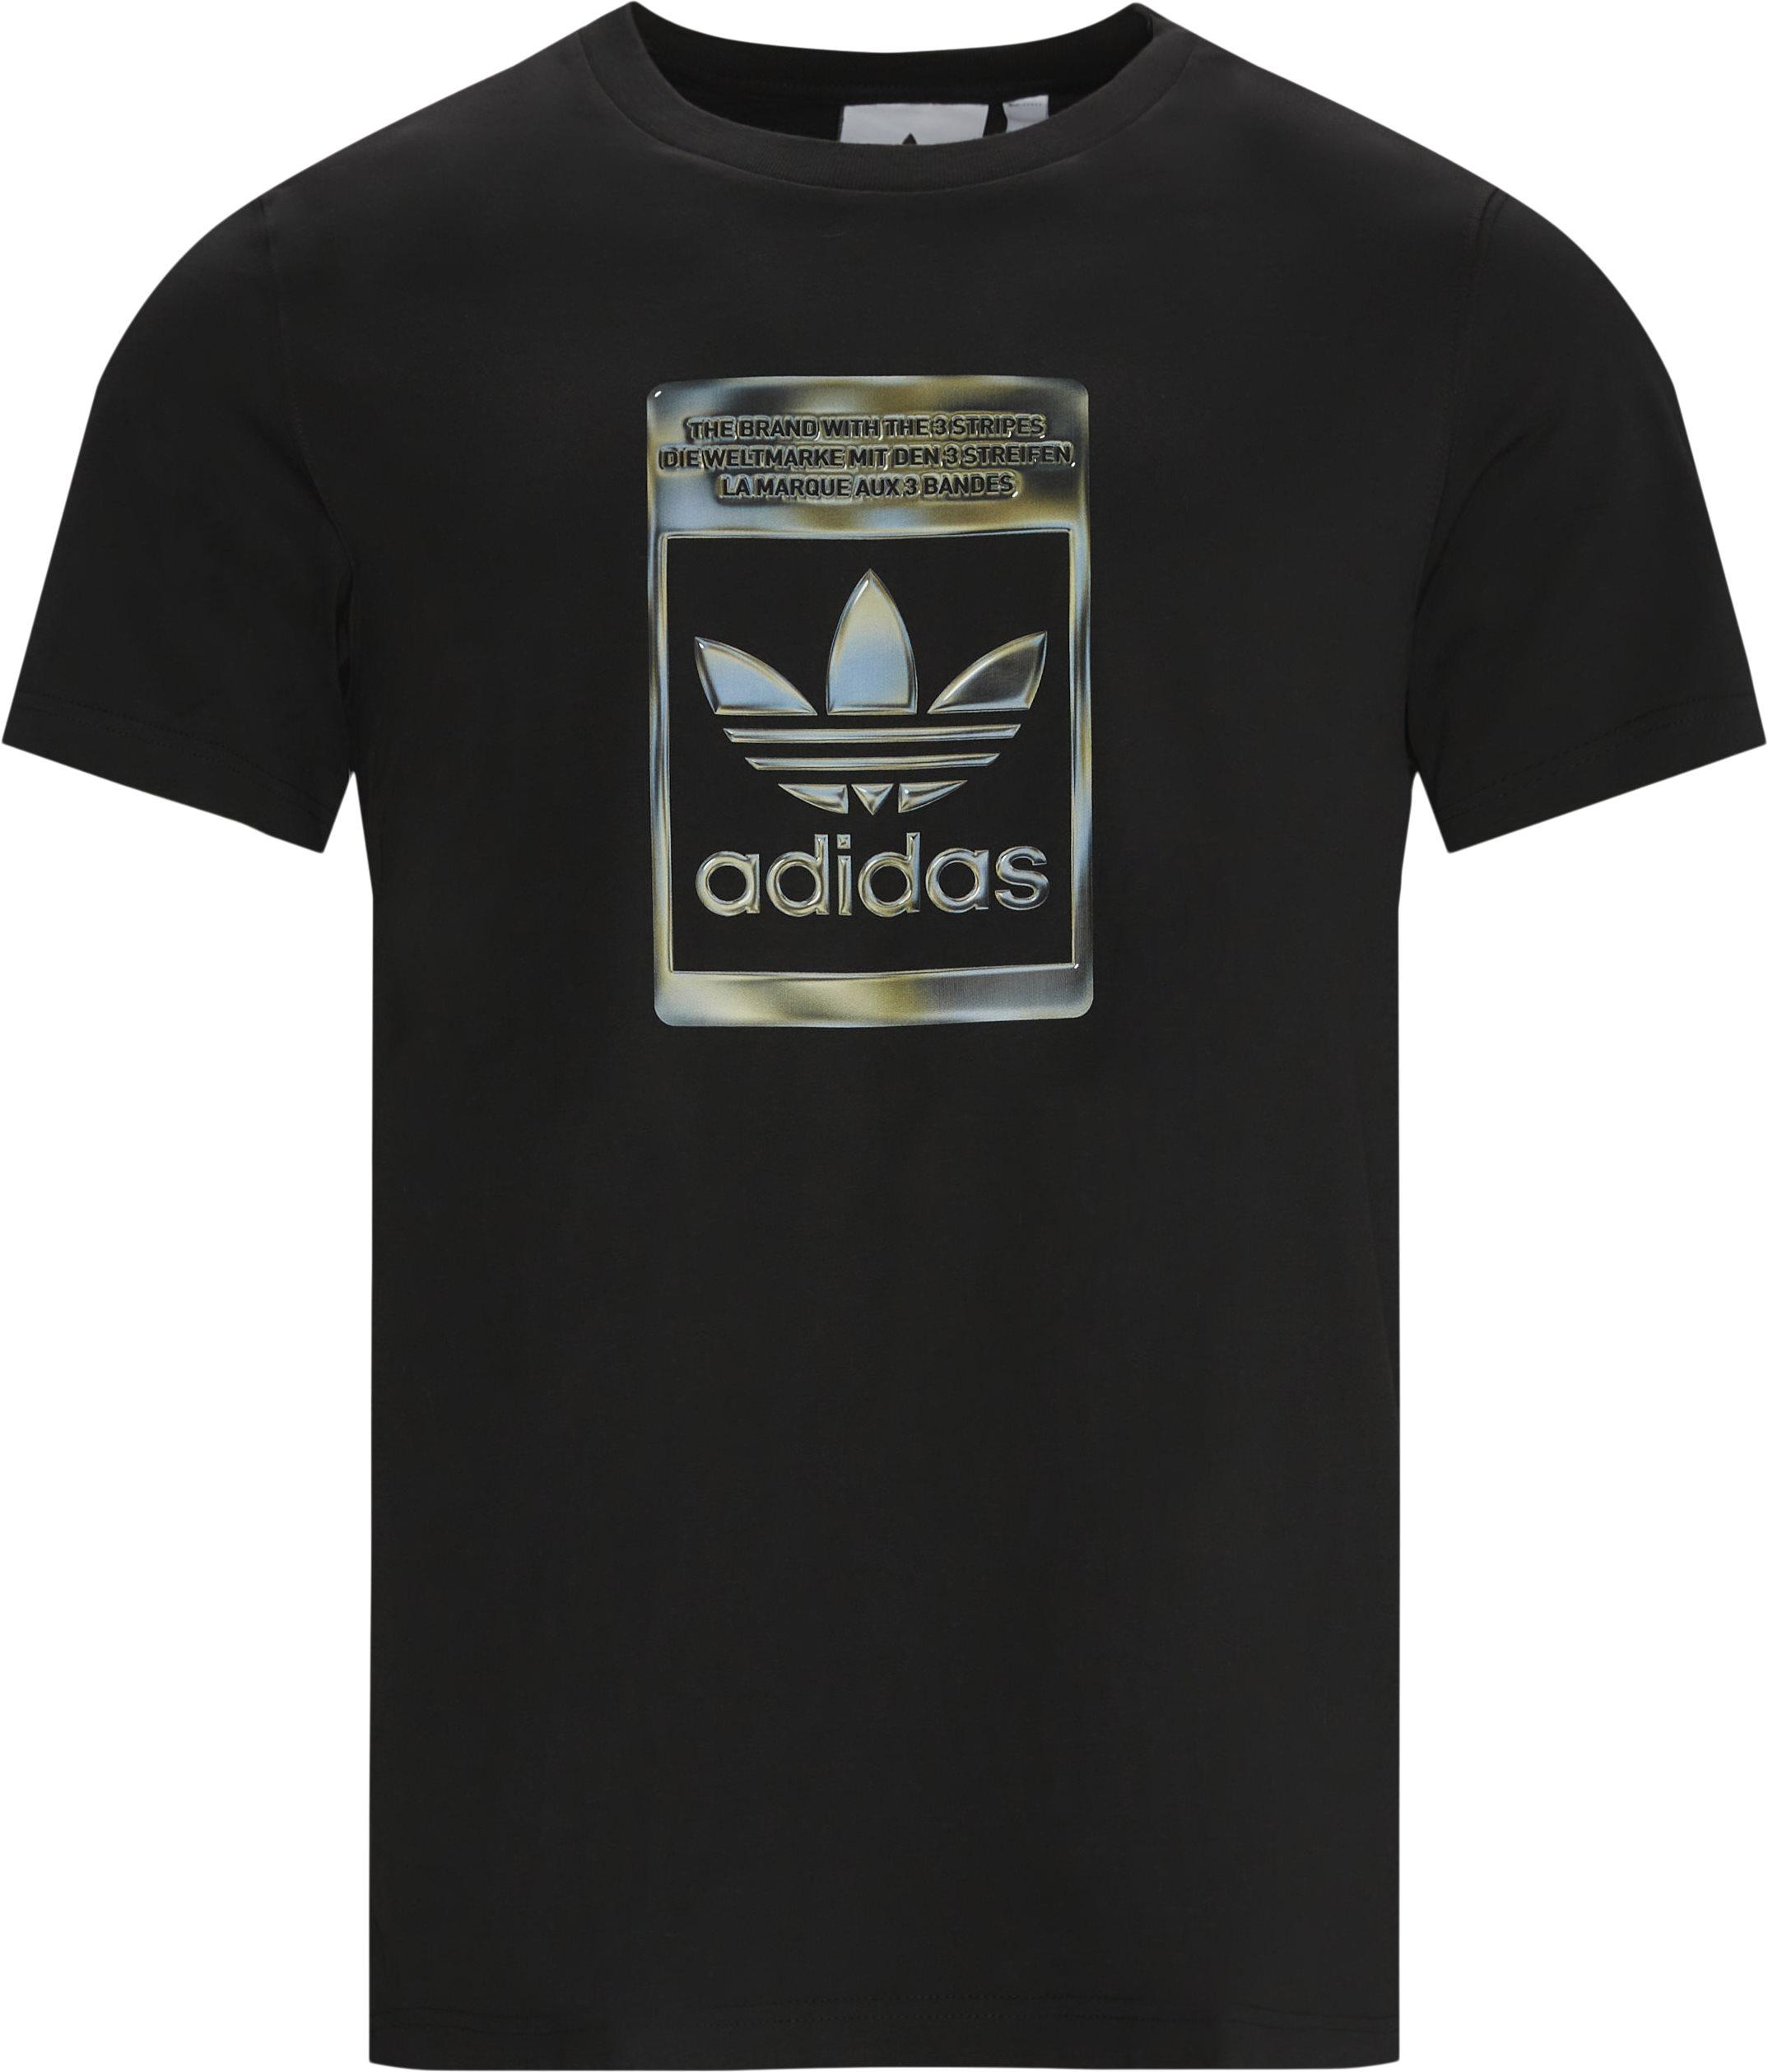 Infill Tee - T-shirts - Regular fit - Sort